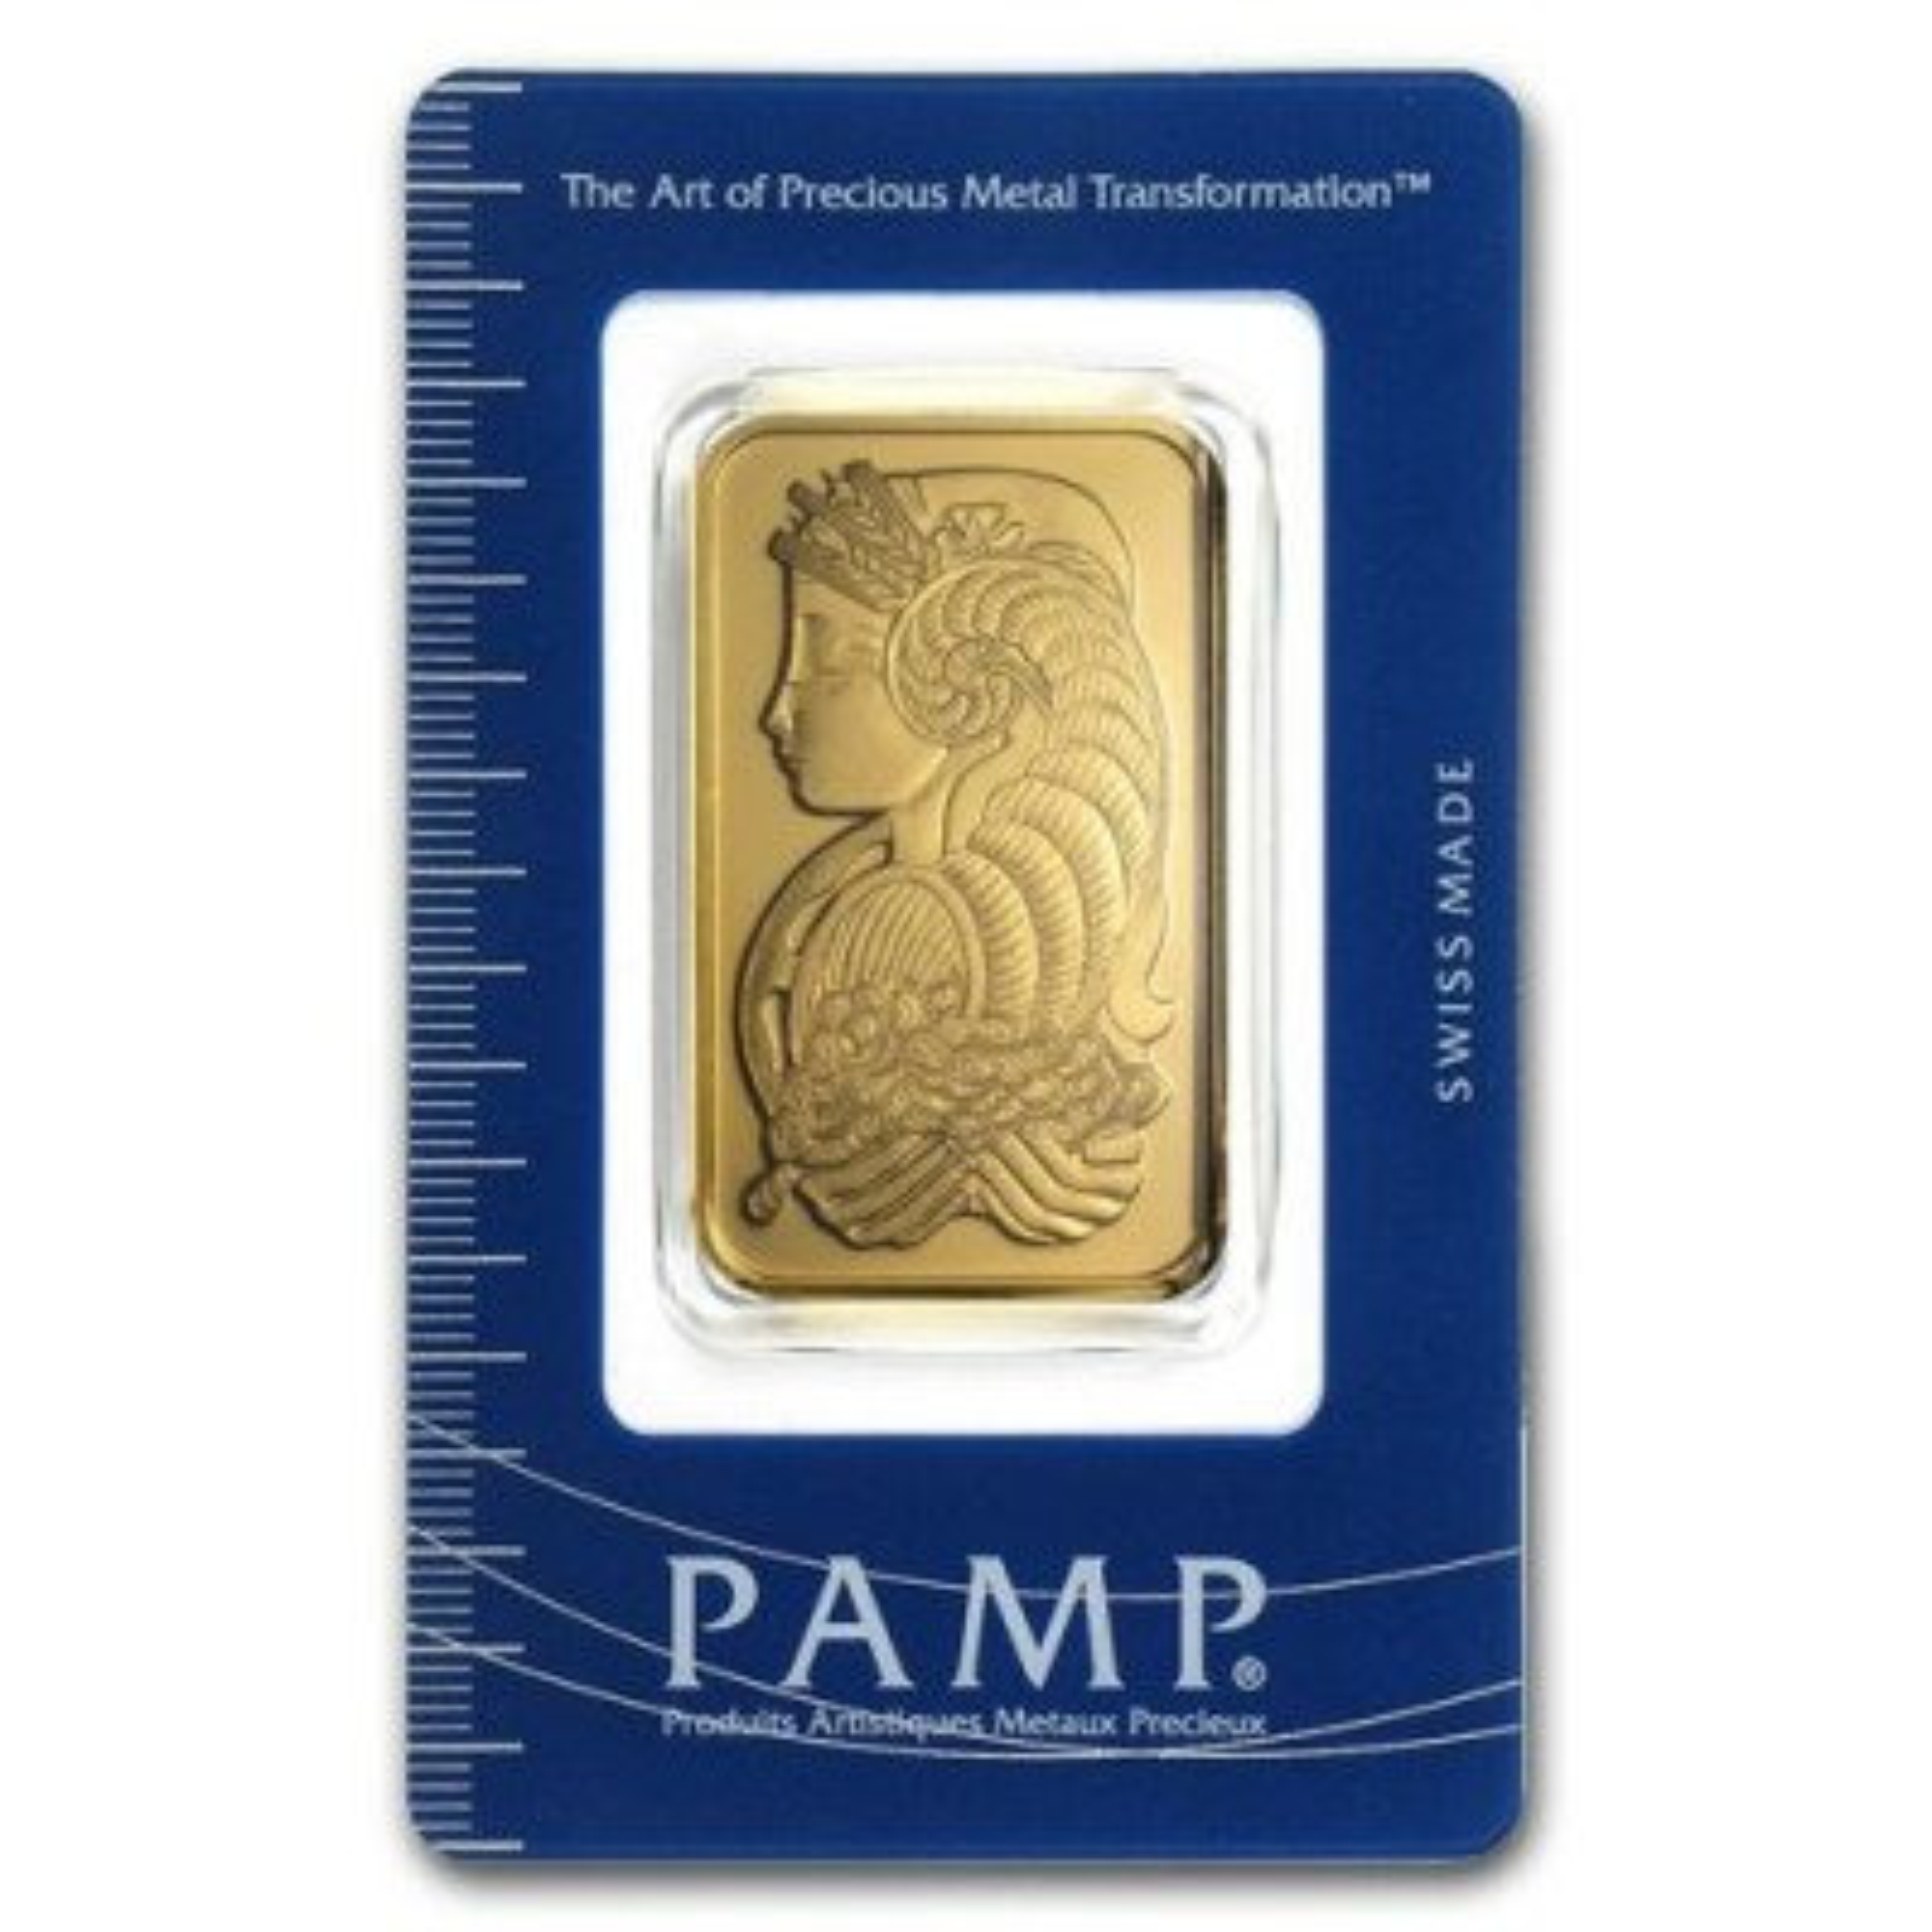 1 Troy ounce Pamp Suisse goudbaar Lady Fortuna